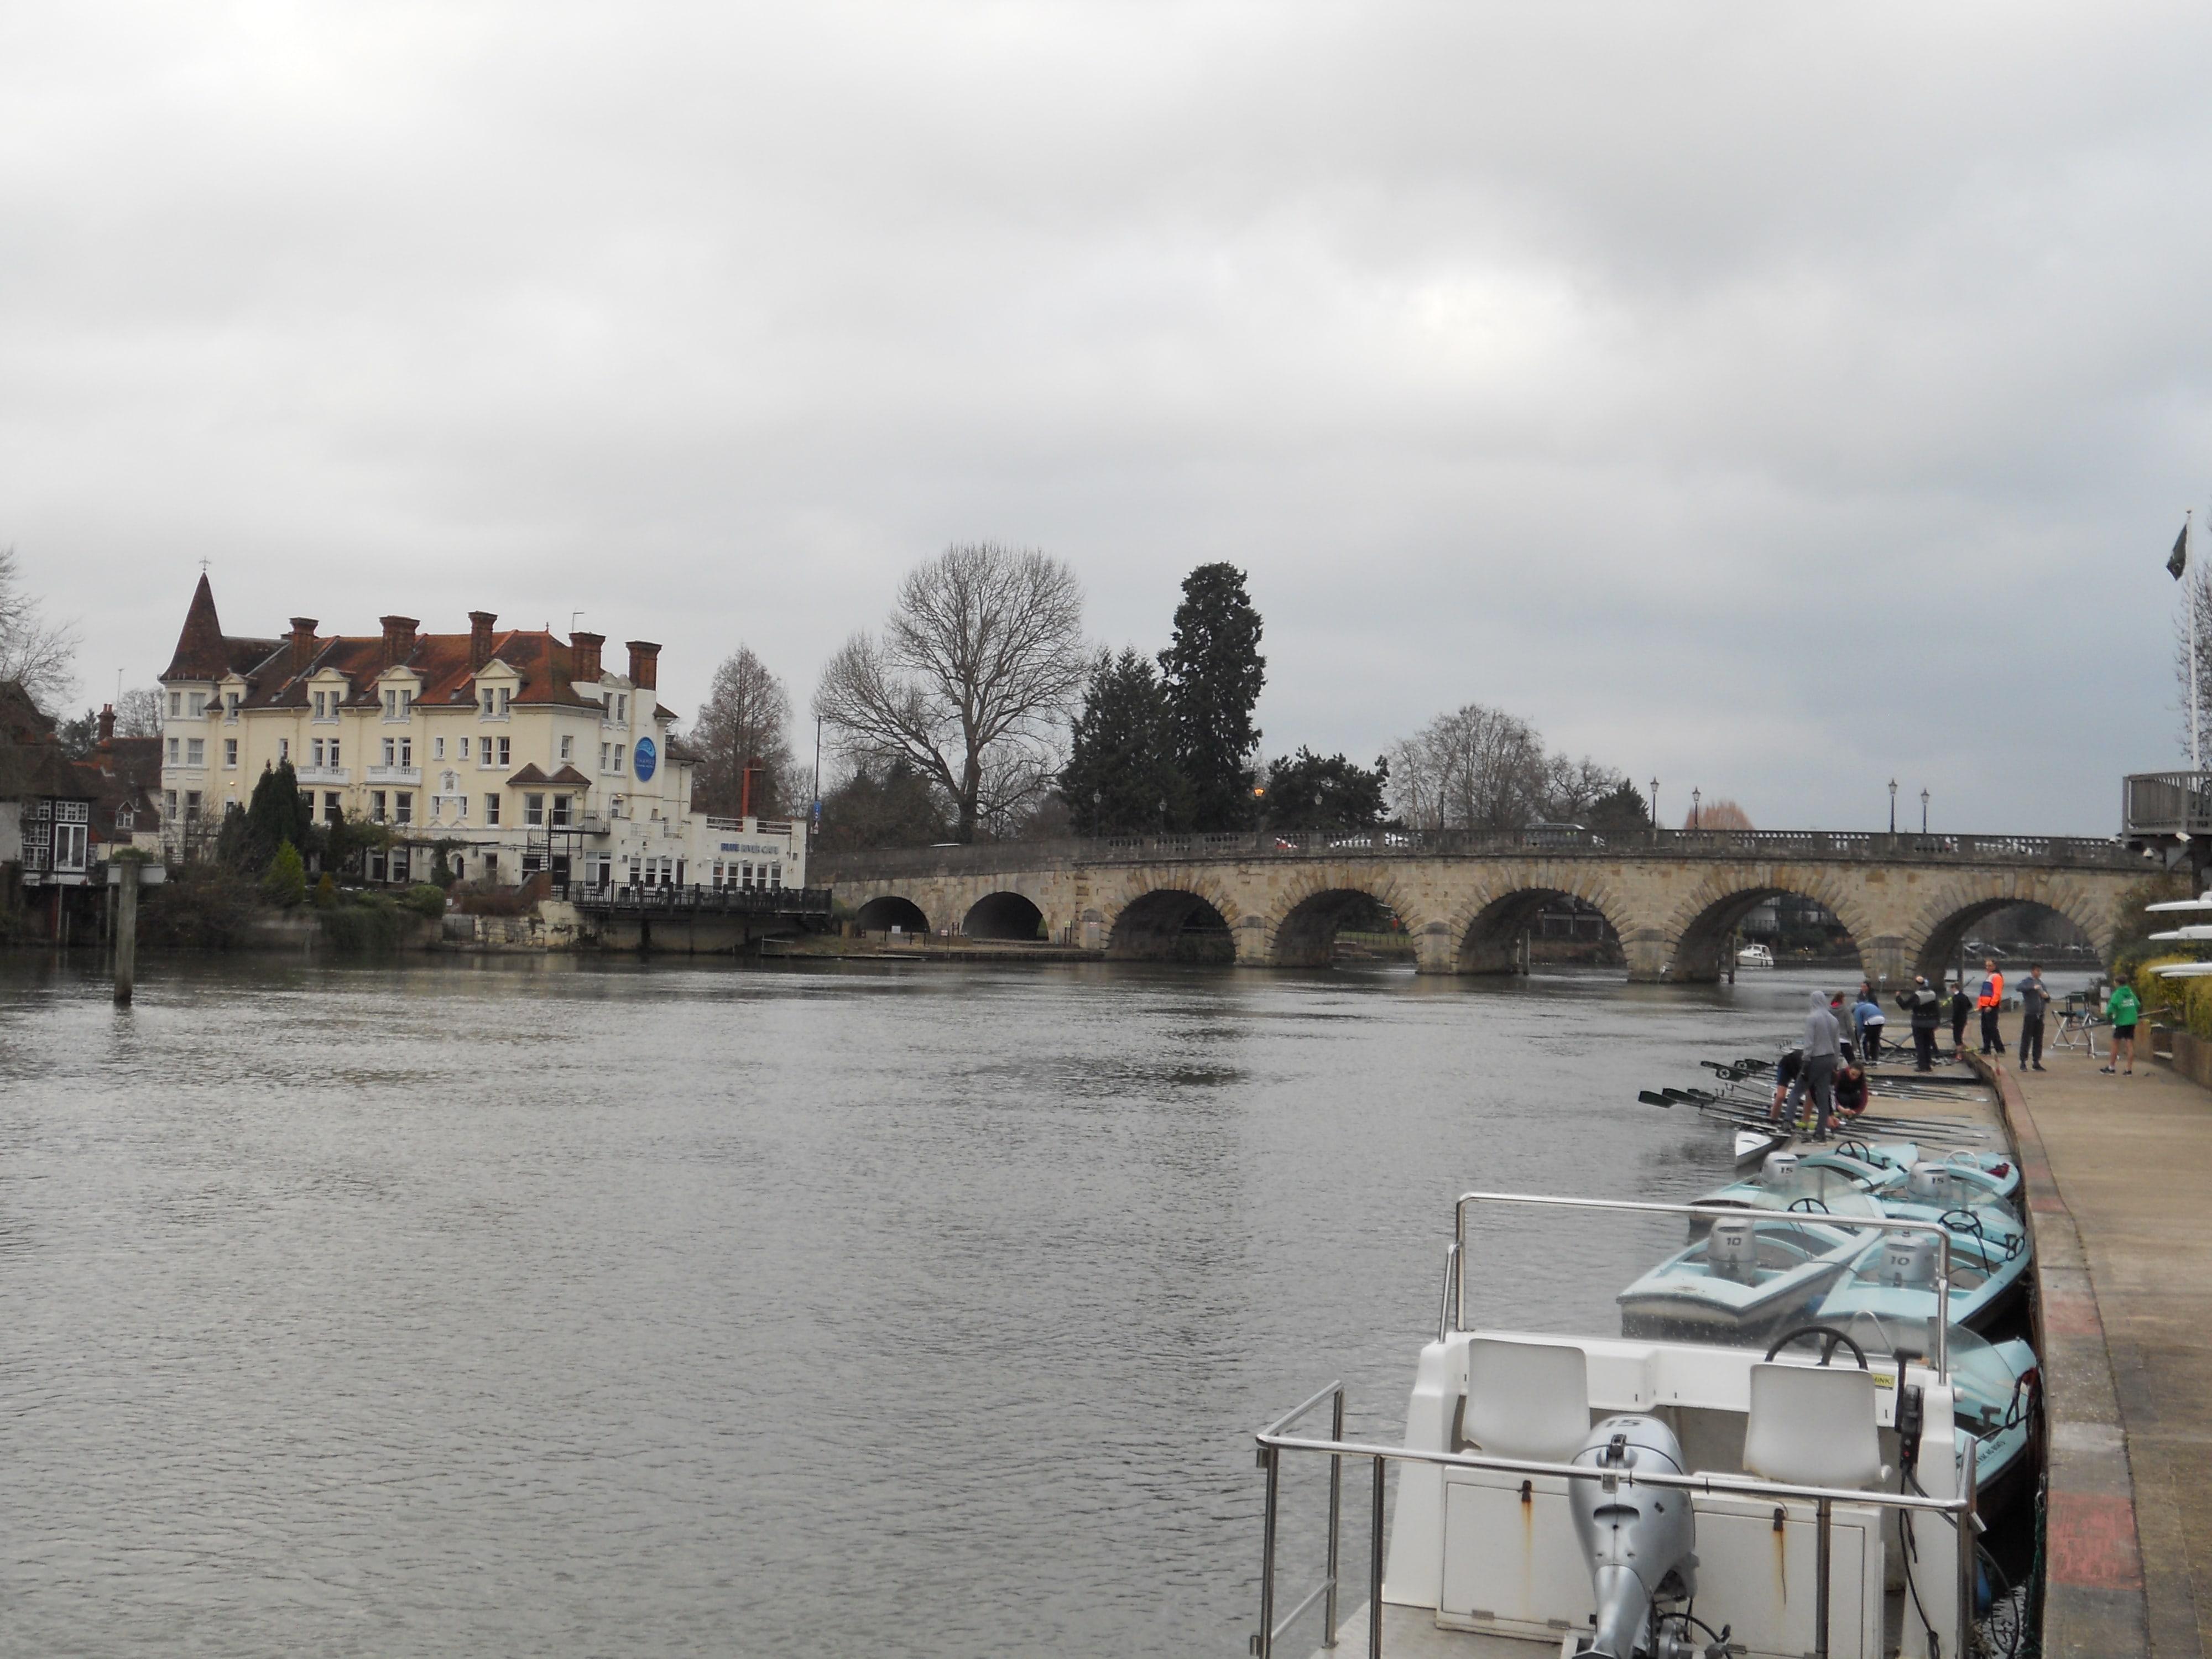 Rowers at Maidenhead Bridge